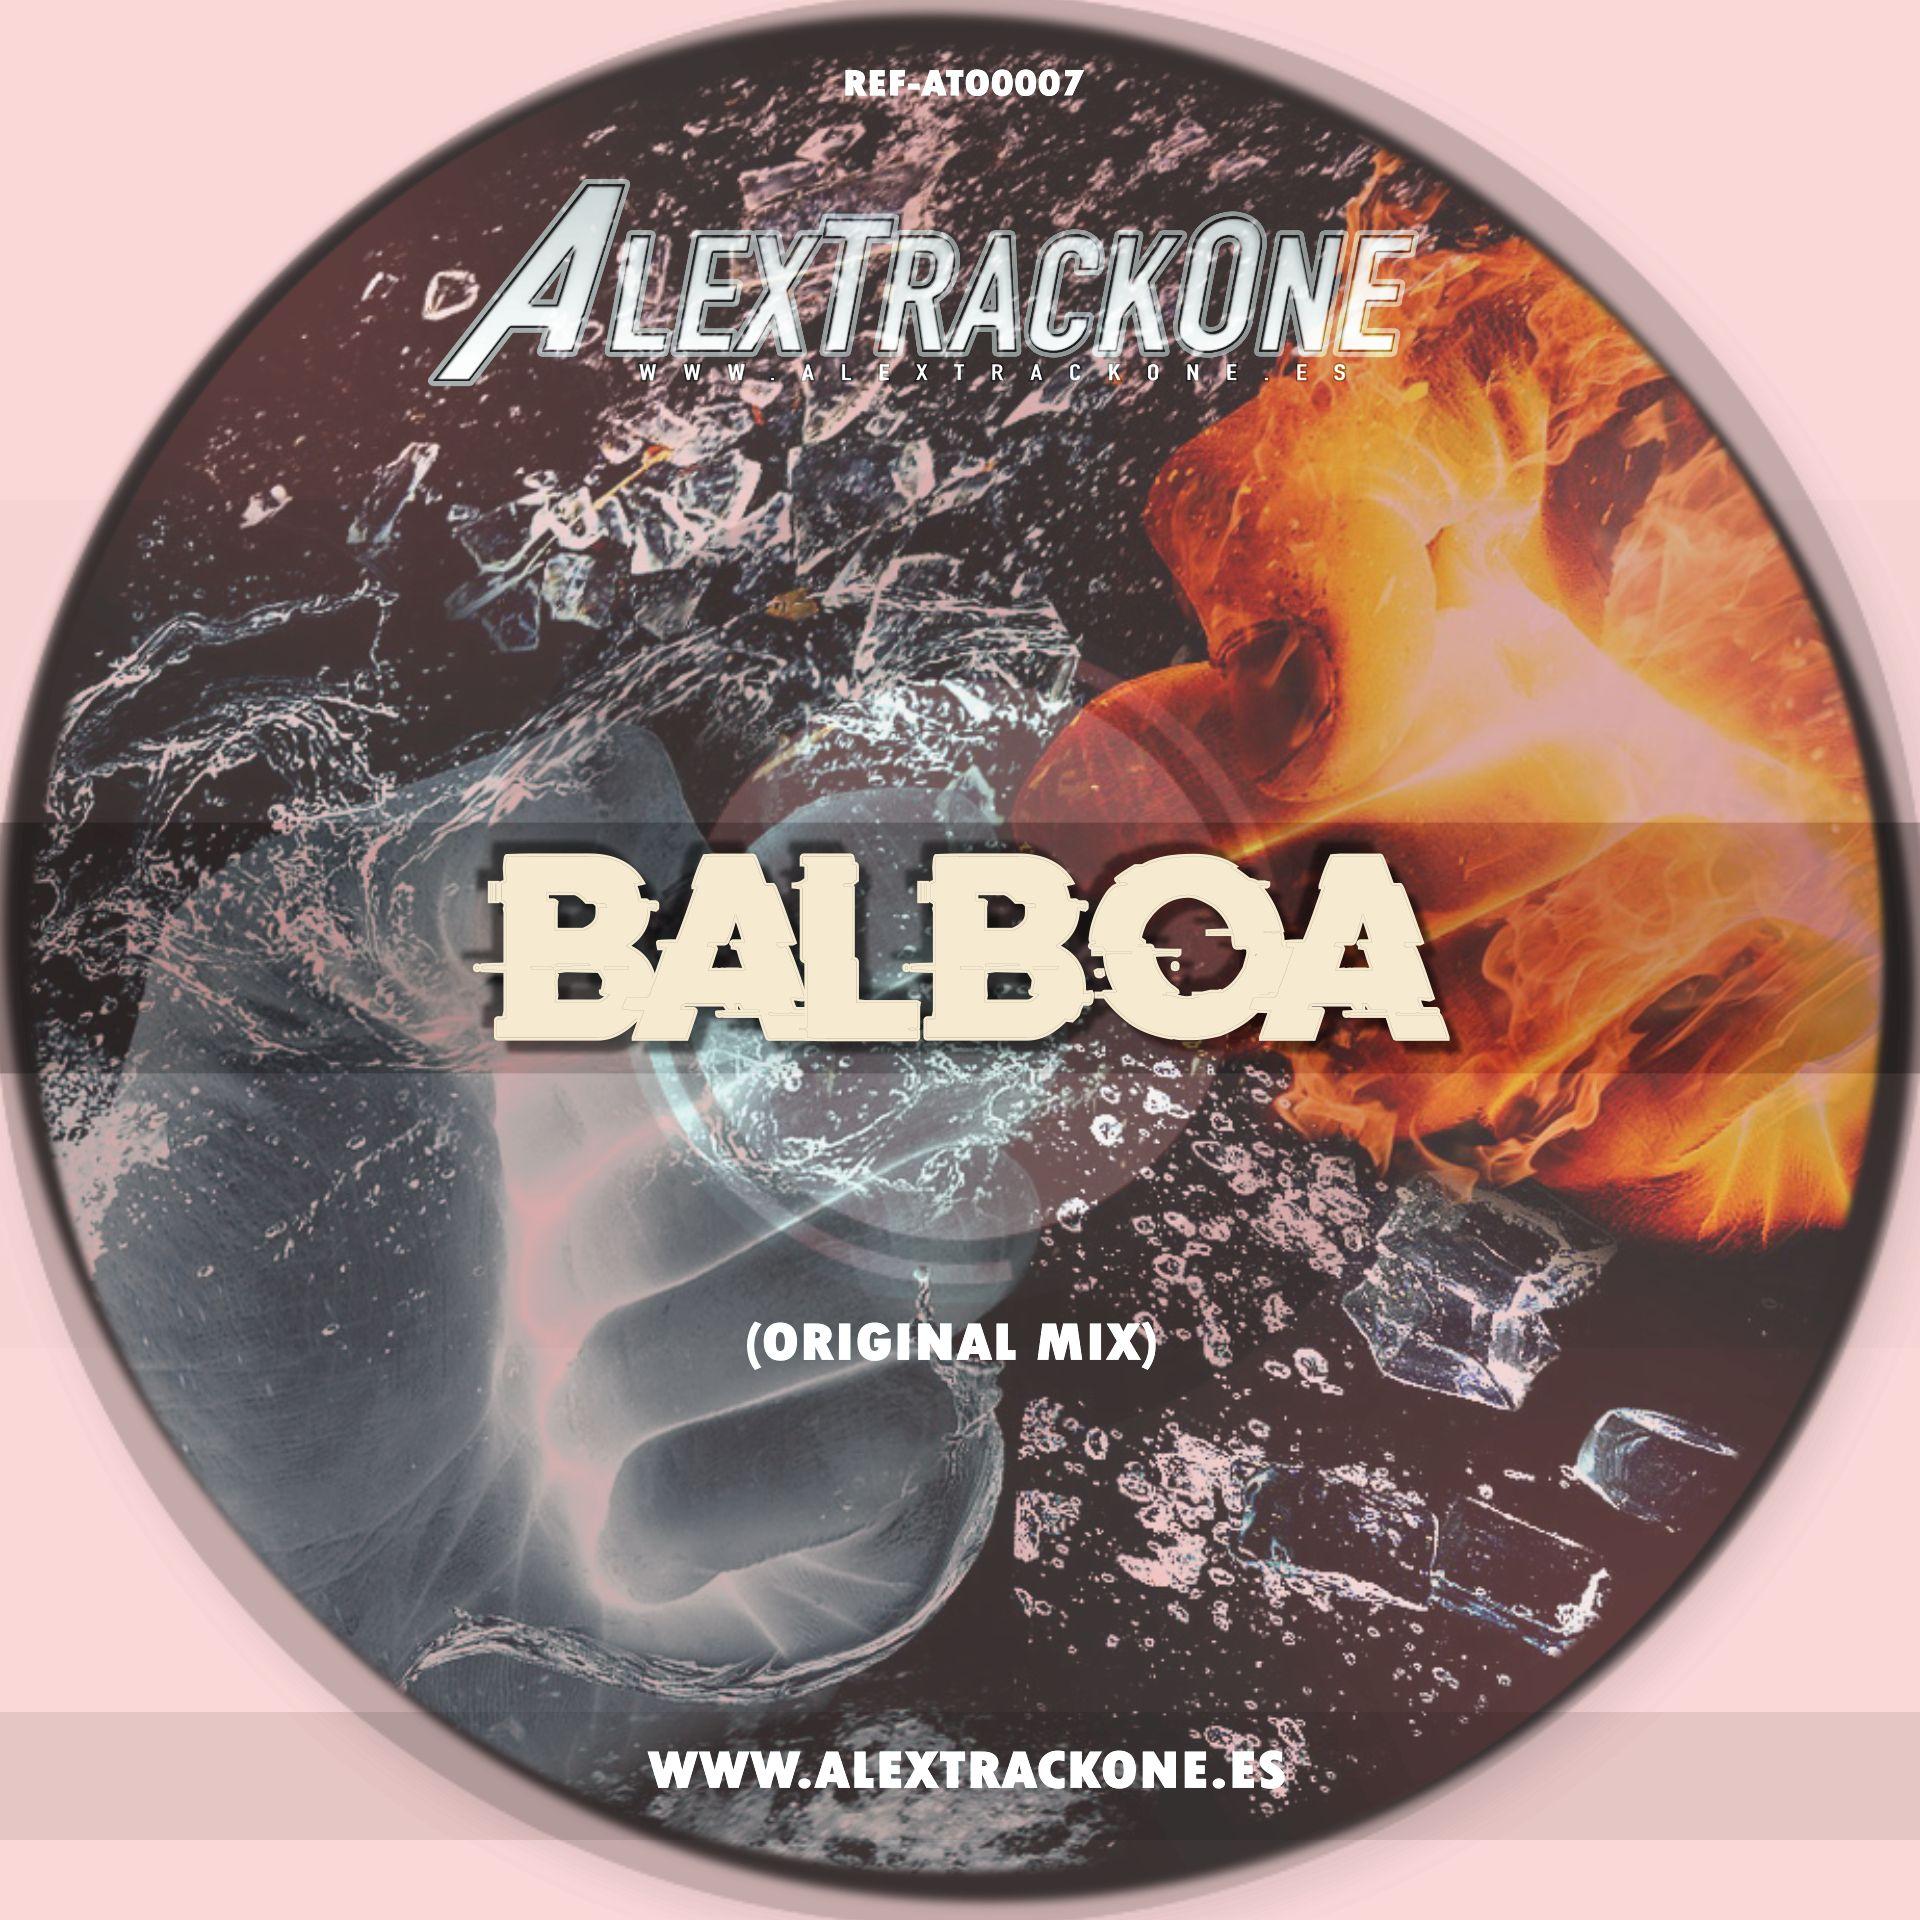 REF-ATO0007 BALBOA (ORIGINAL MIX) (MP3 & WAV)